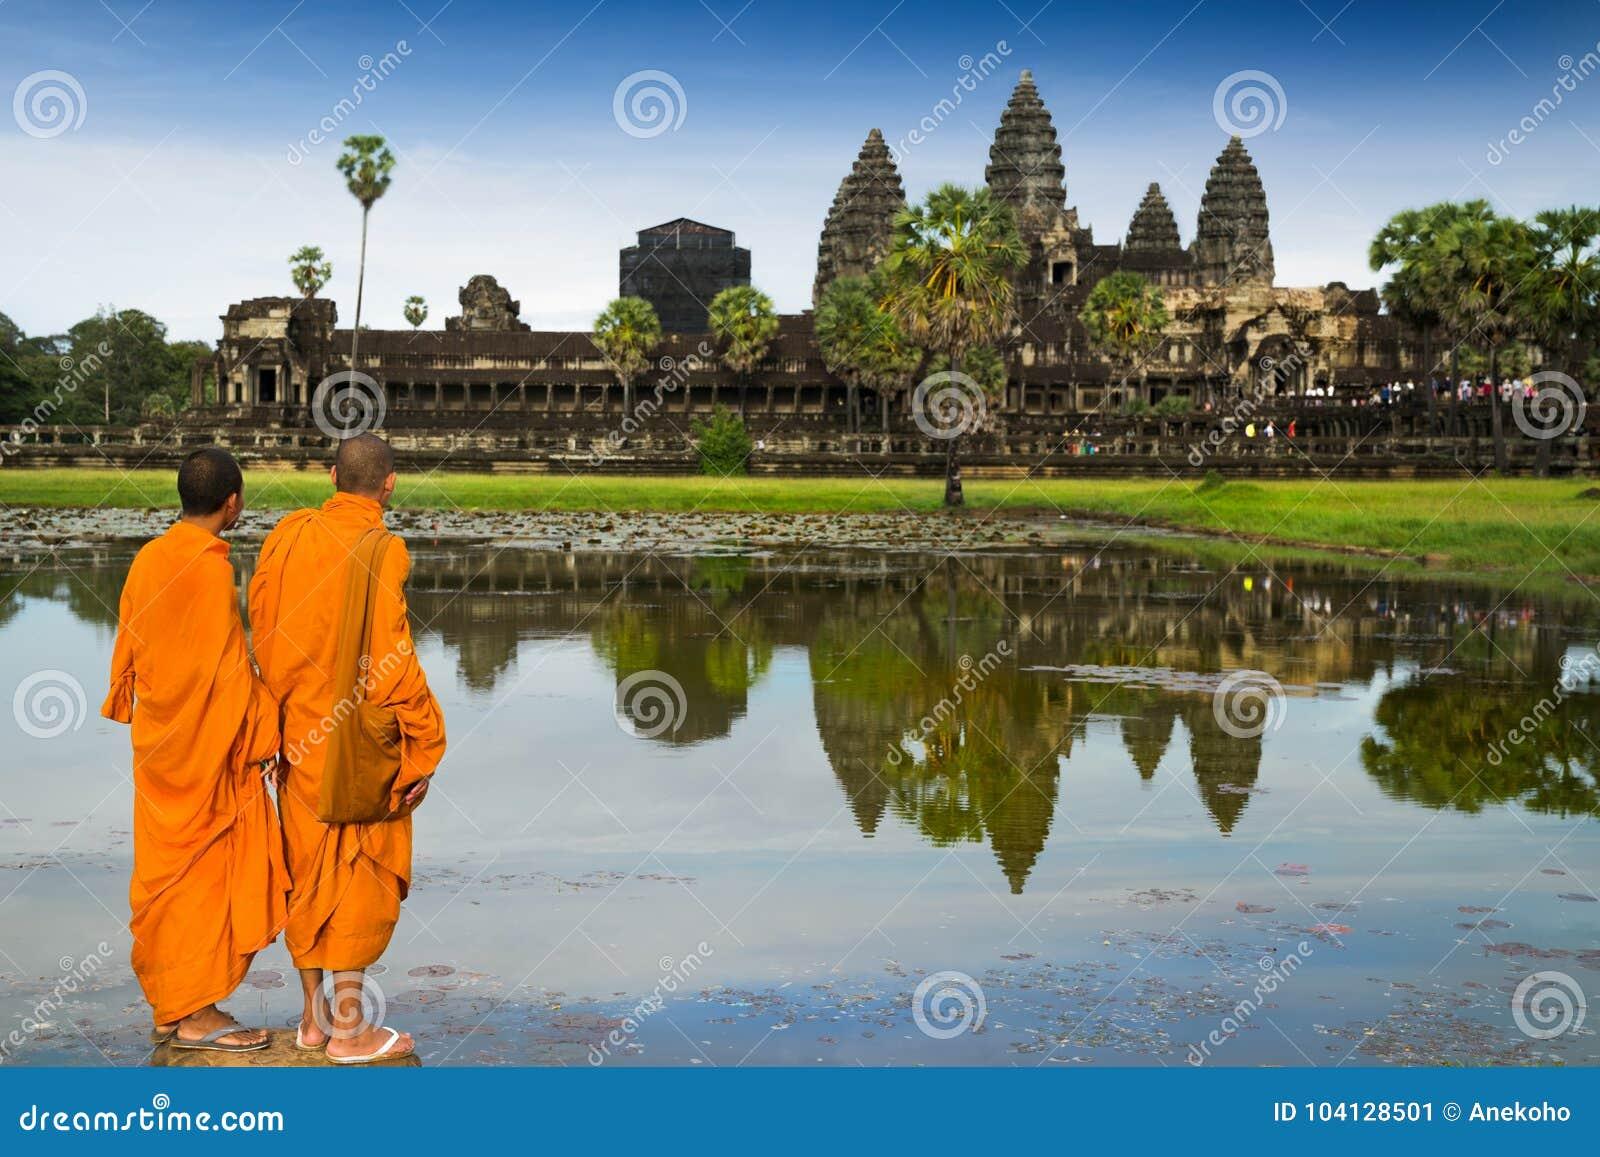 Monniken in boeddhisme in Angkor wat